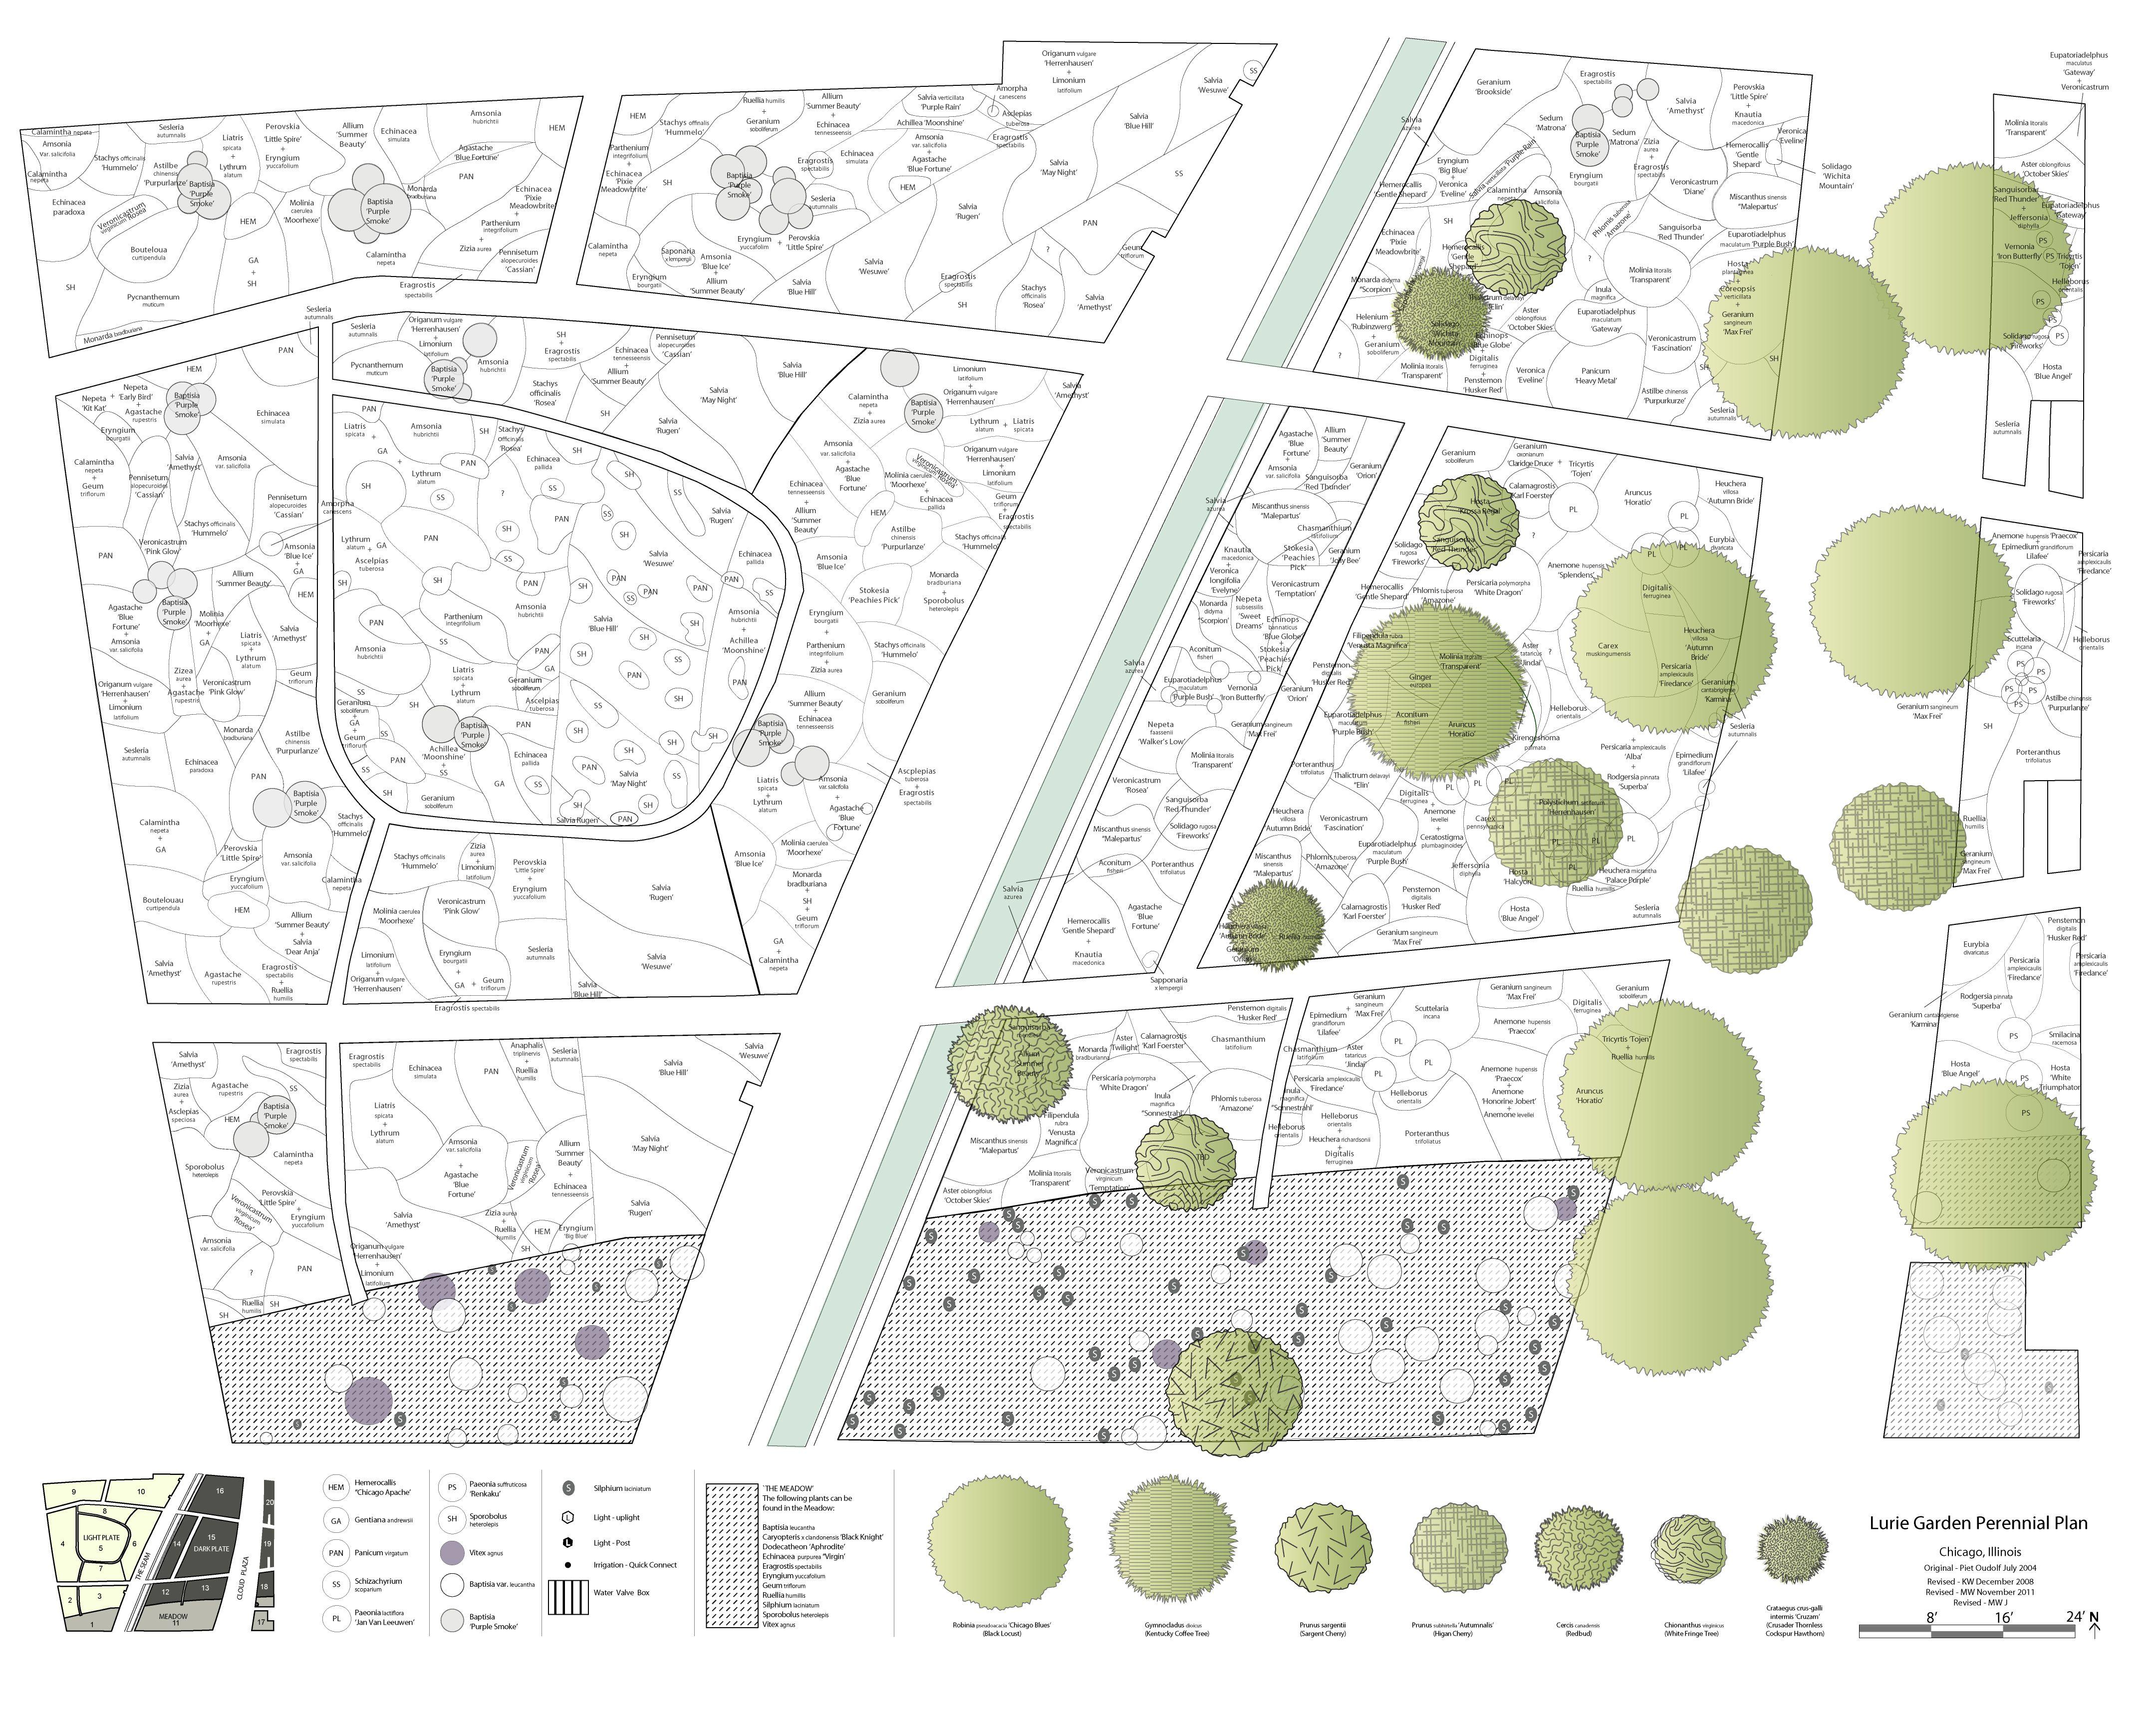 perennial plans lurie garden planting plan millennium